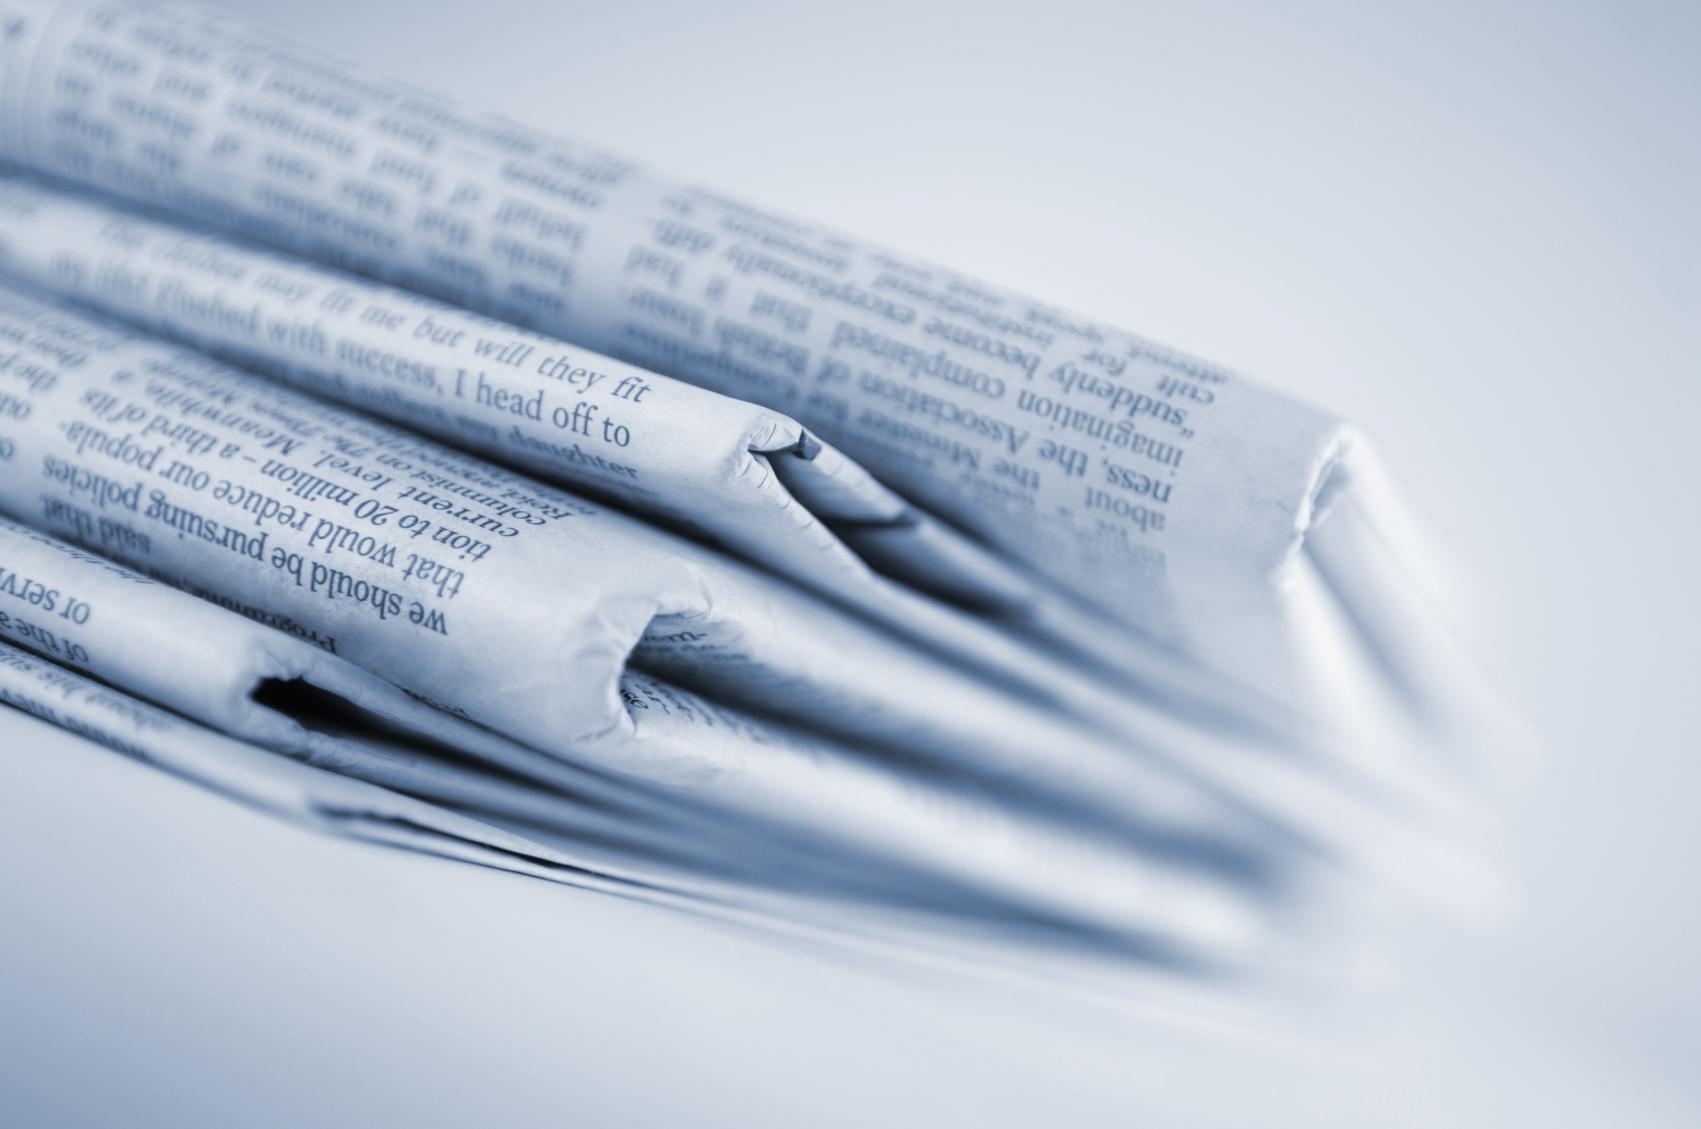 Zeitung oder BLOG?